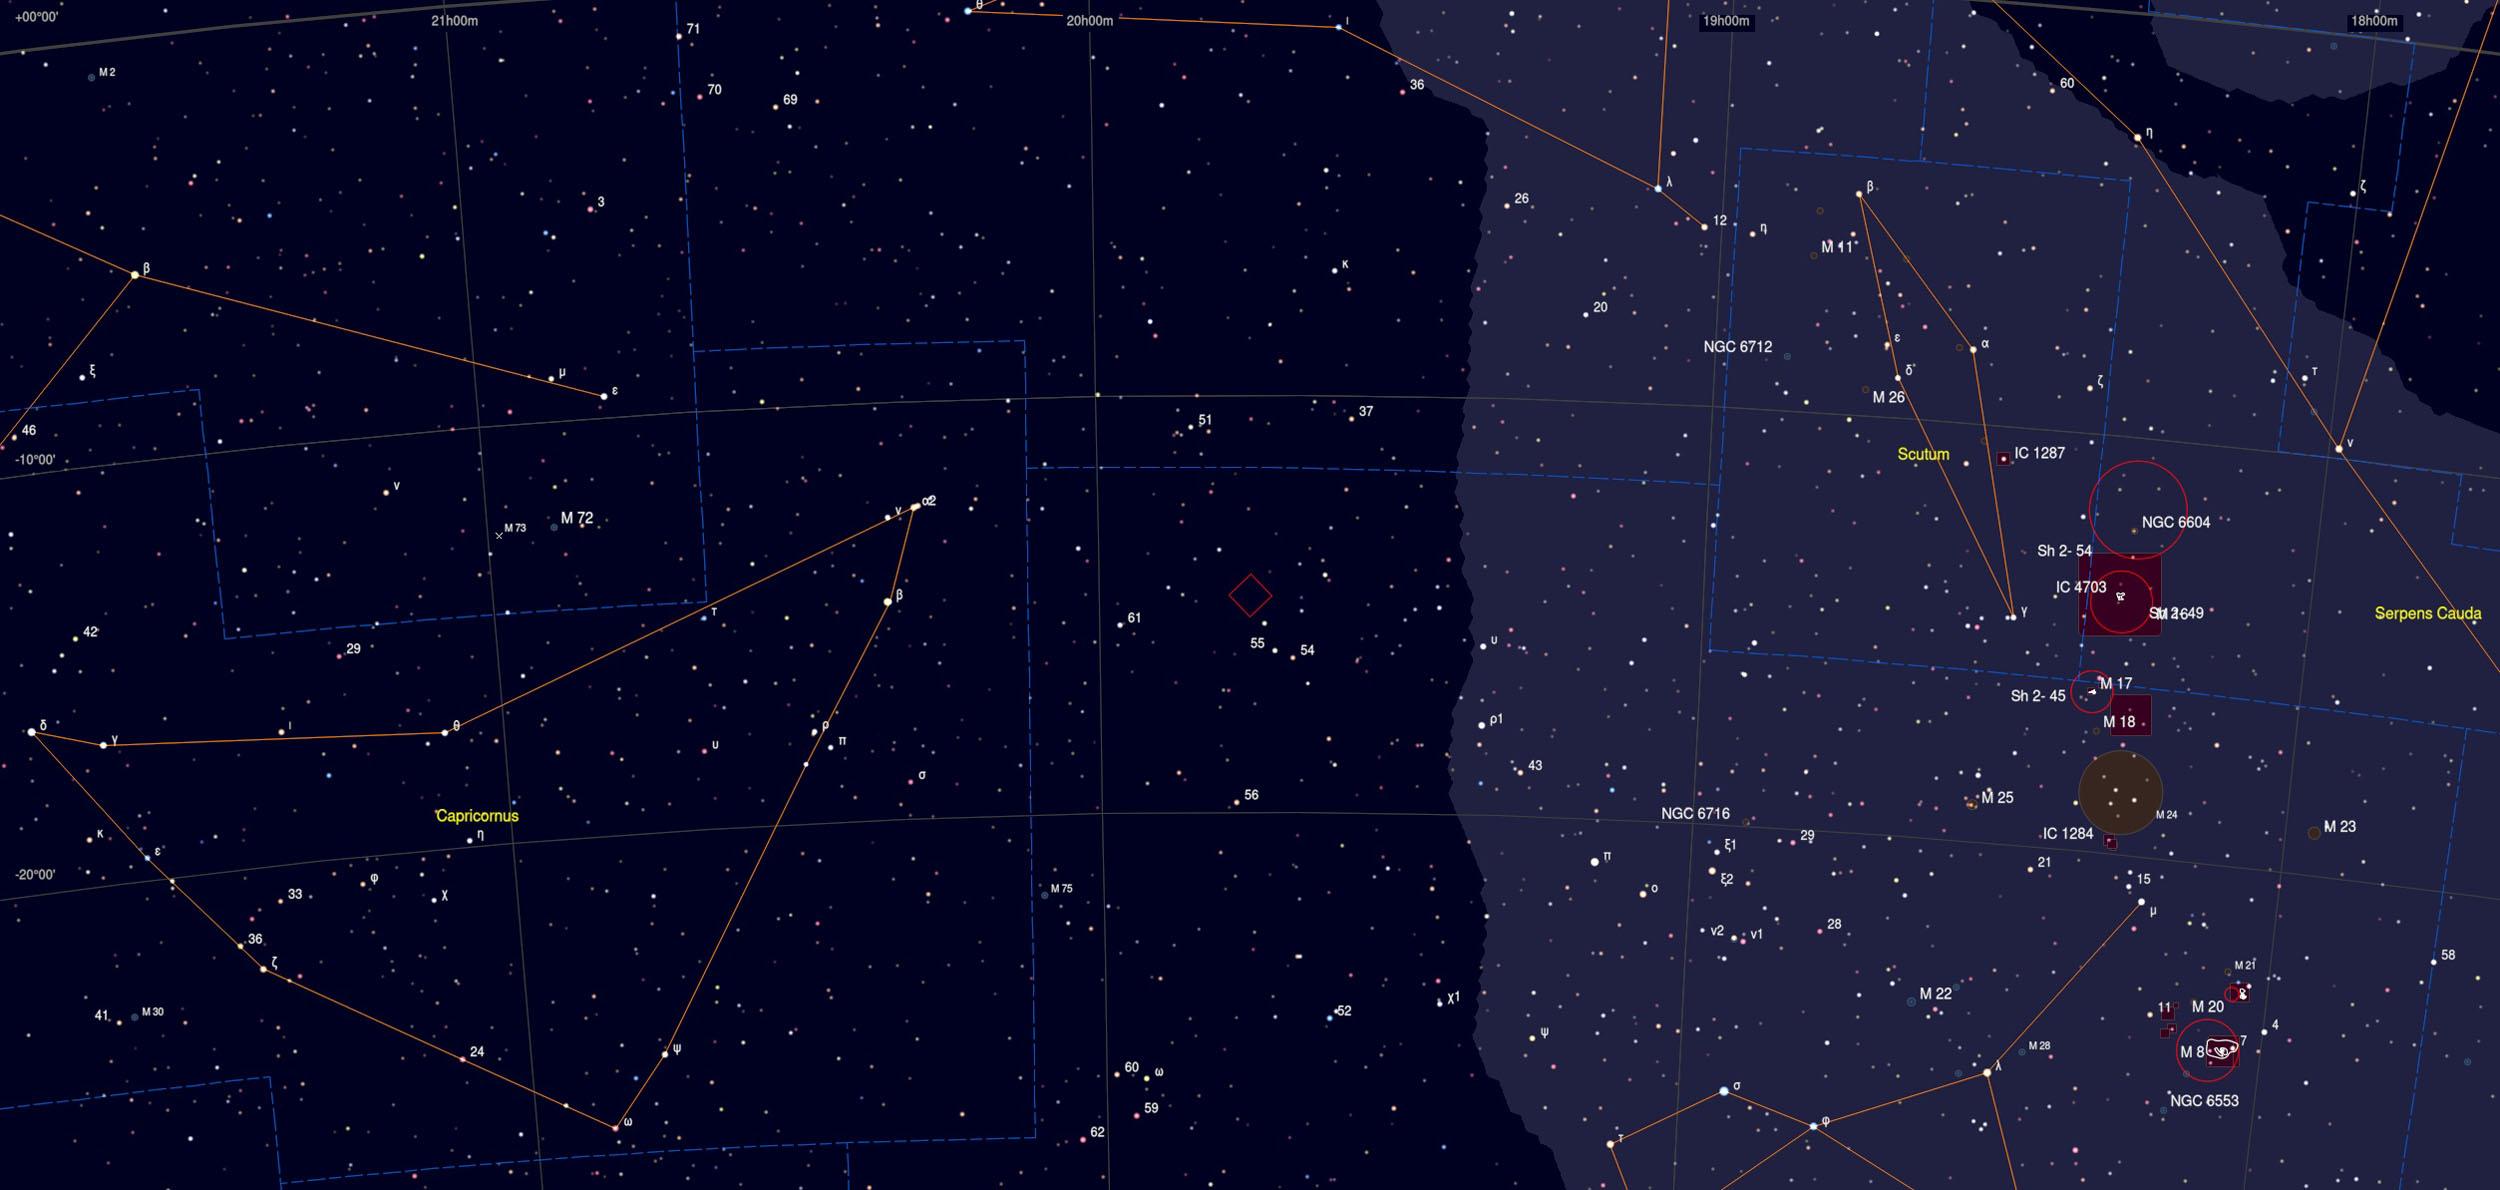 NGC 6822 Galaxy Sky Chart Astrophotography Martin Rusterholz